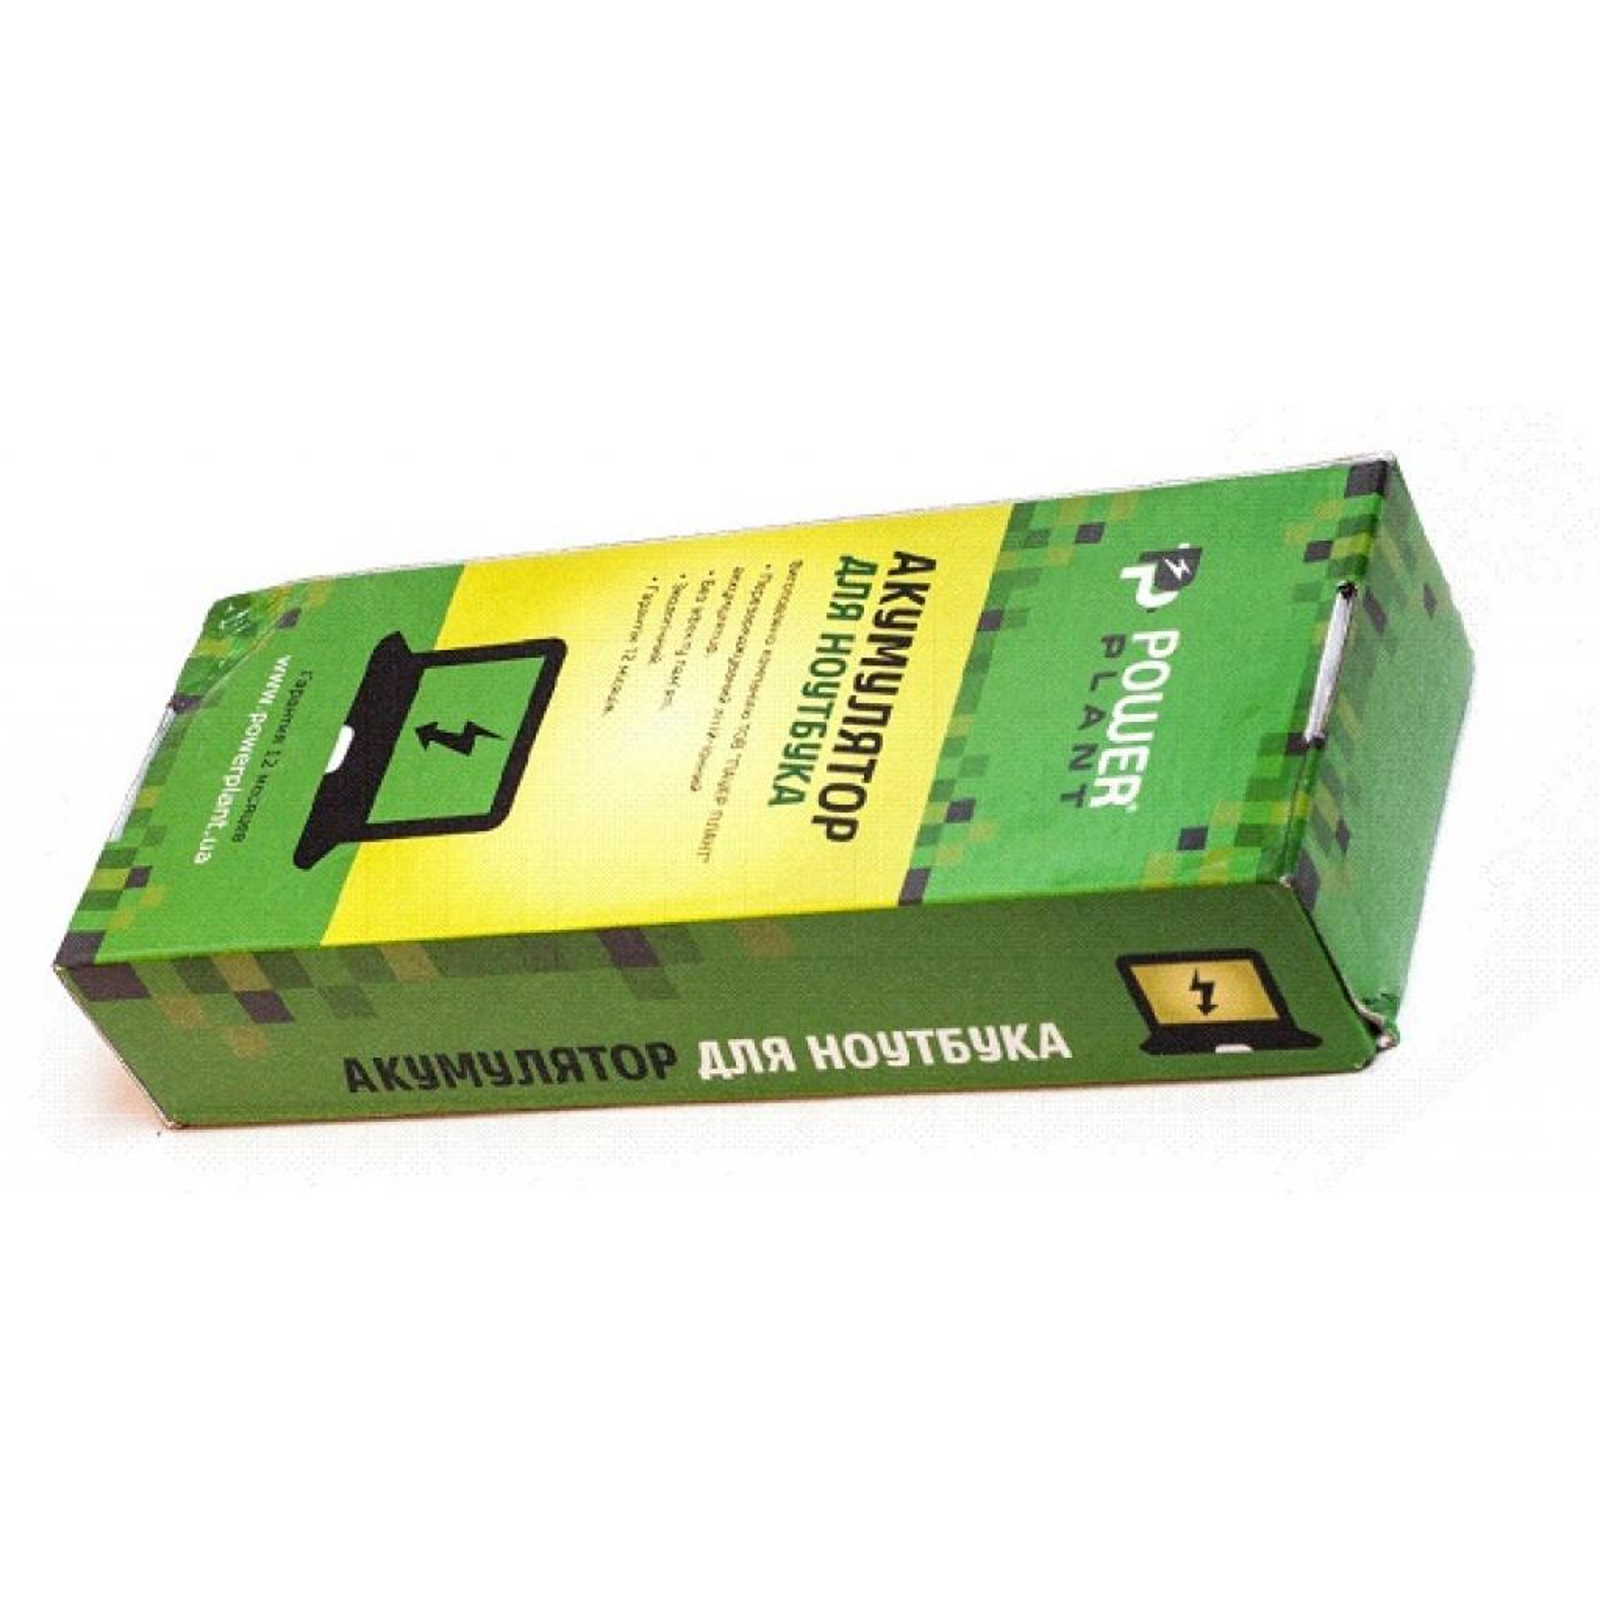 Аккумулятор для ноутбука SONY VAIO PCG-505 (PCGA-BP51) 11,1V 2200mAh PowerPlant (NB00000193) изображение 3